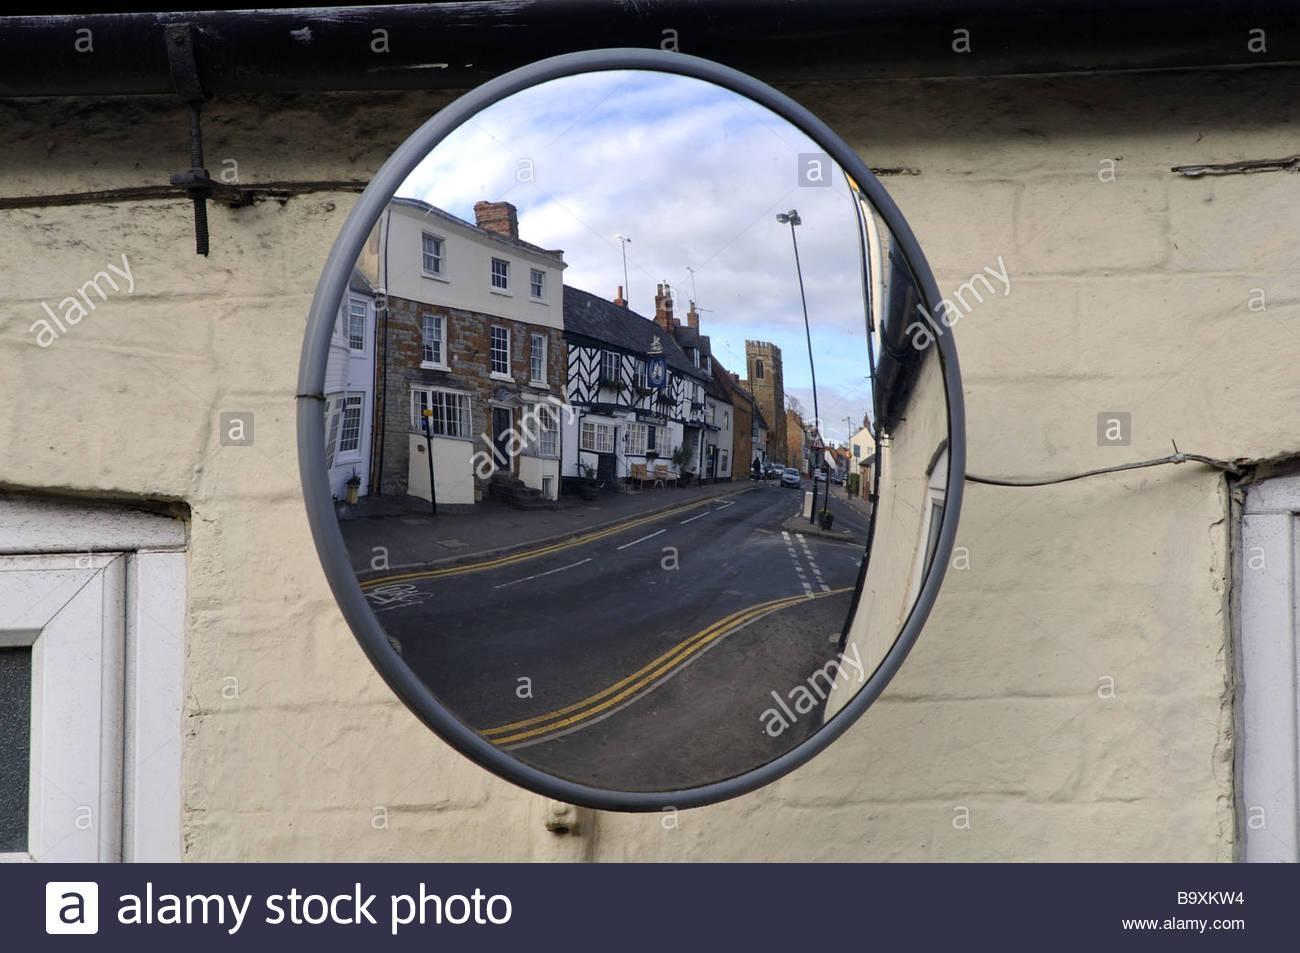 Convex Car Mirror Stock Photos & Convex Car Mirror Stock Images Inside Convex Mirror Buy (View 14 of 20)